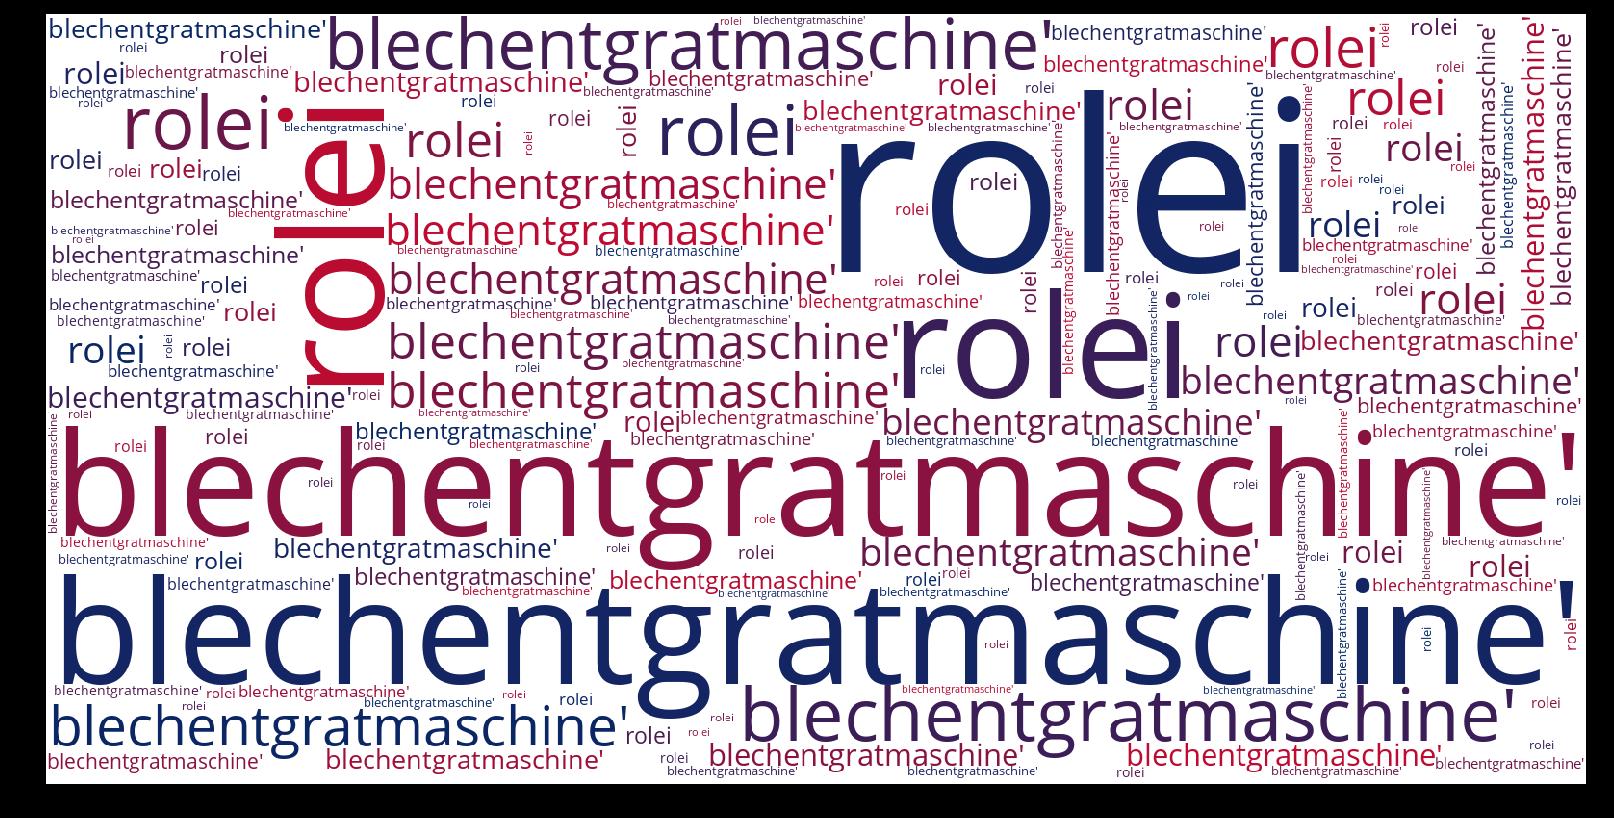 Blechentgratmaschine-wordcloud